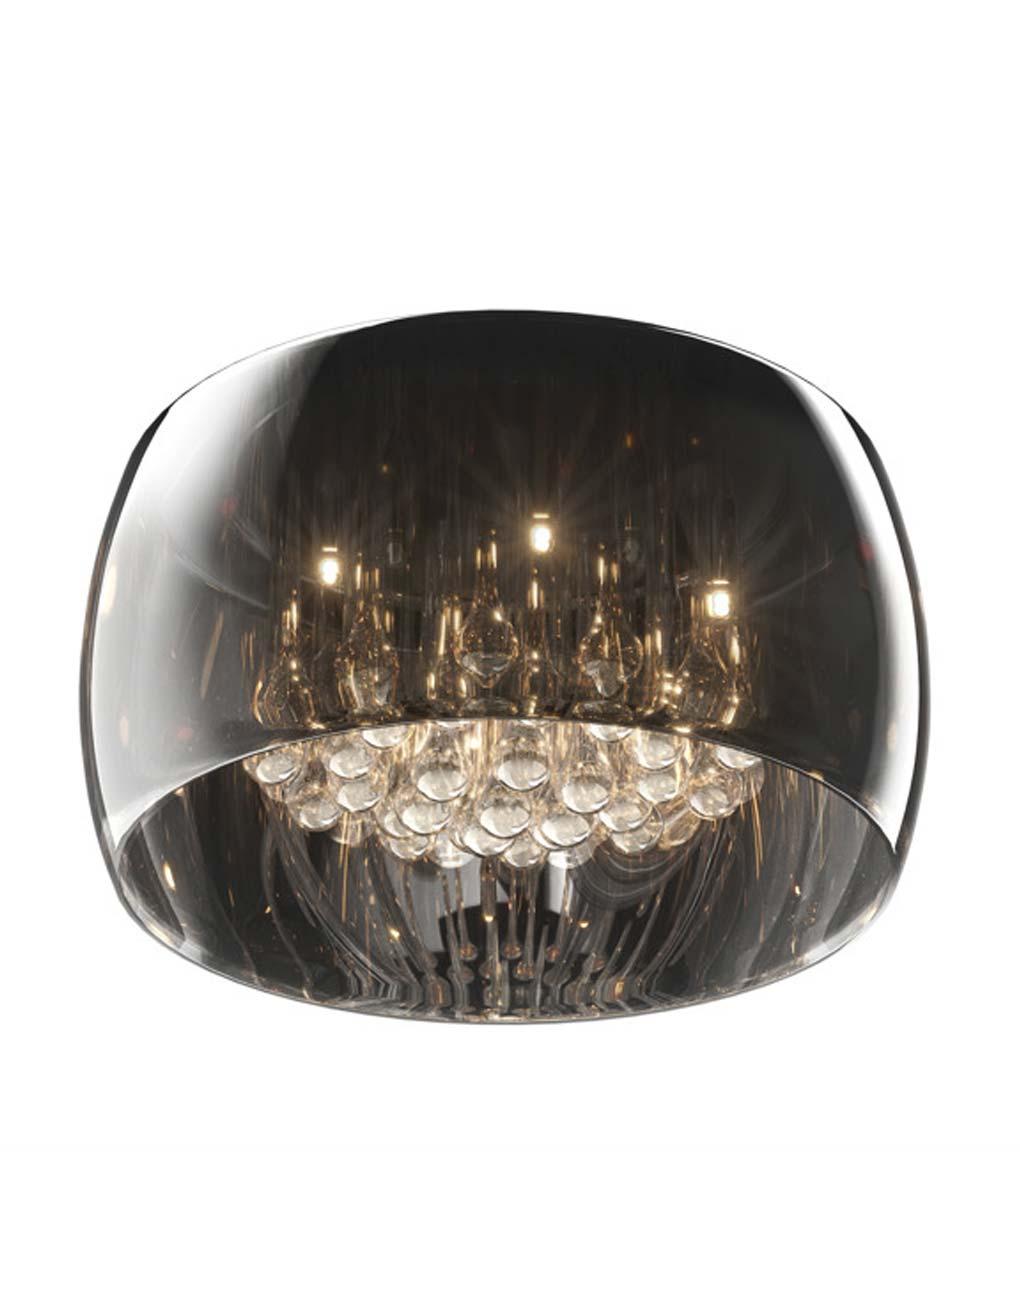 Plafondlamp gerookt glas kristal